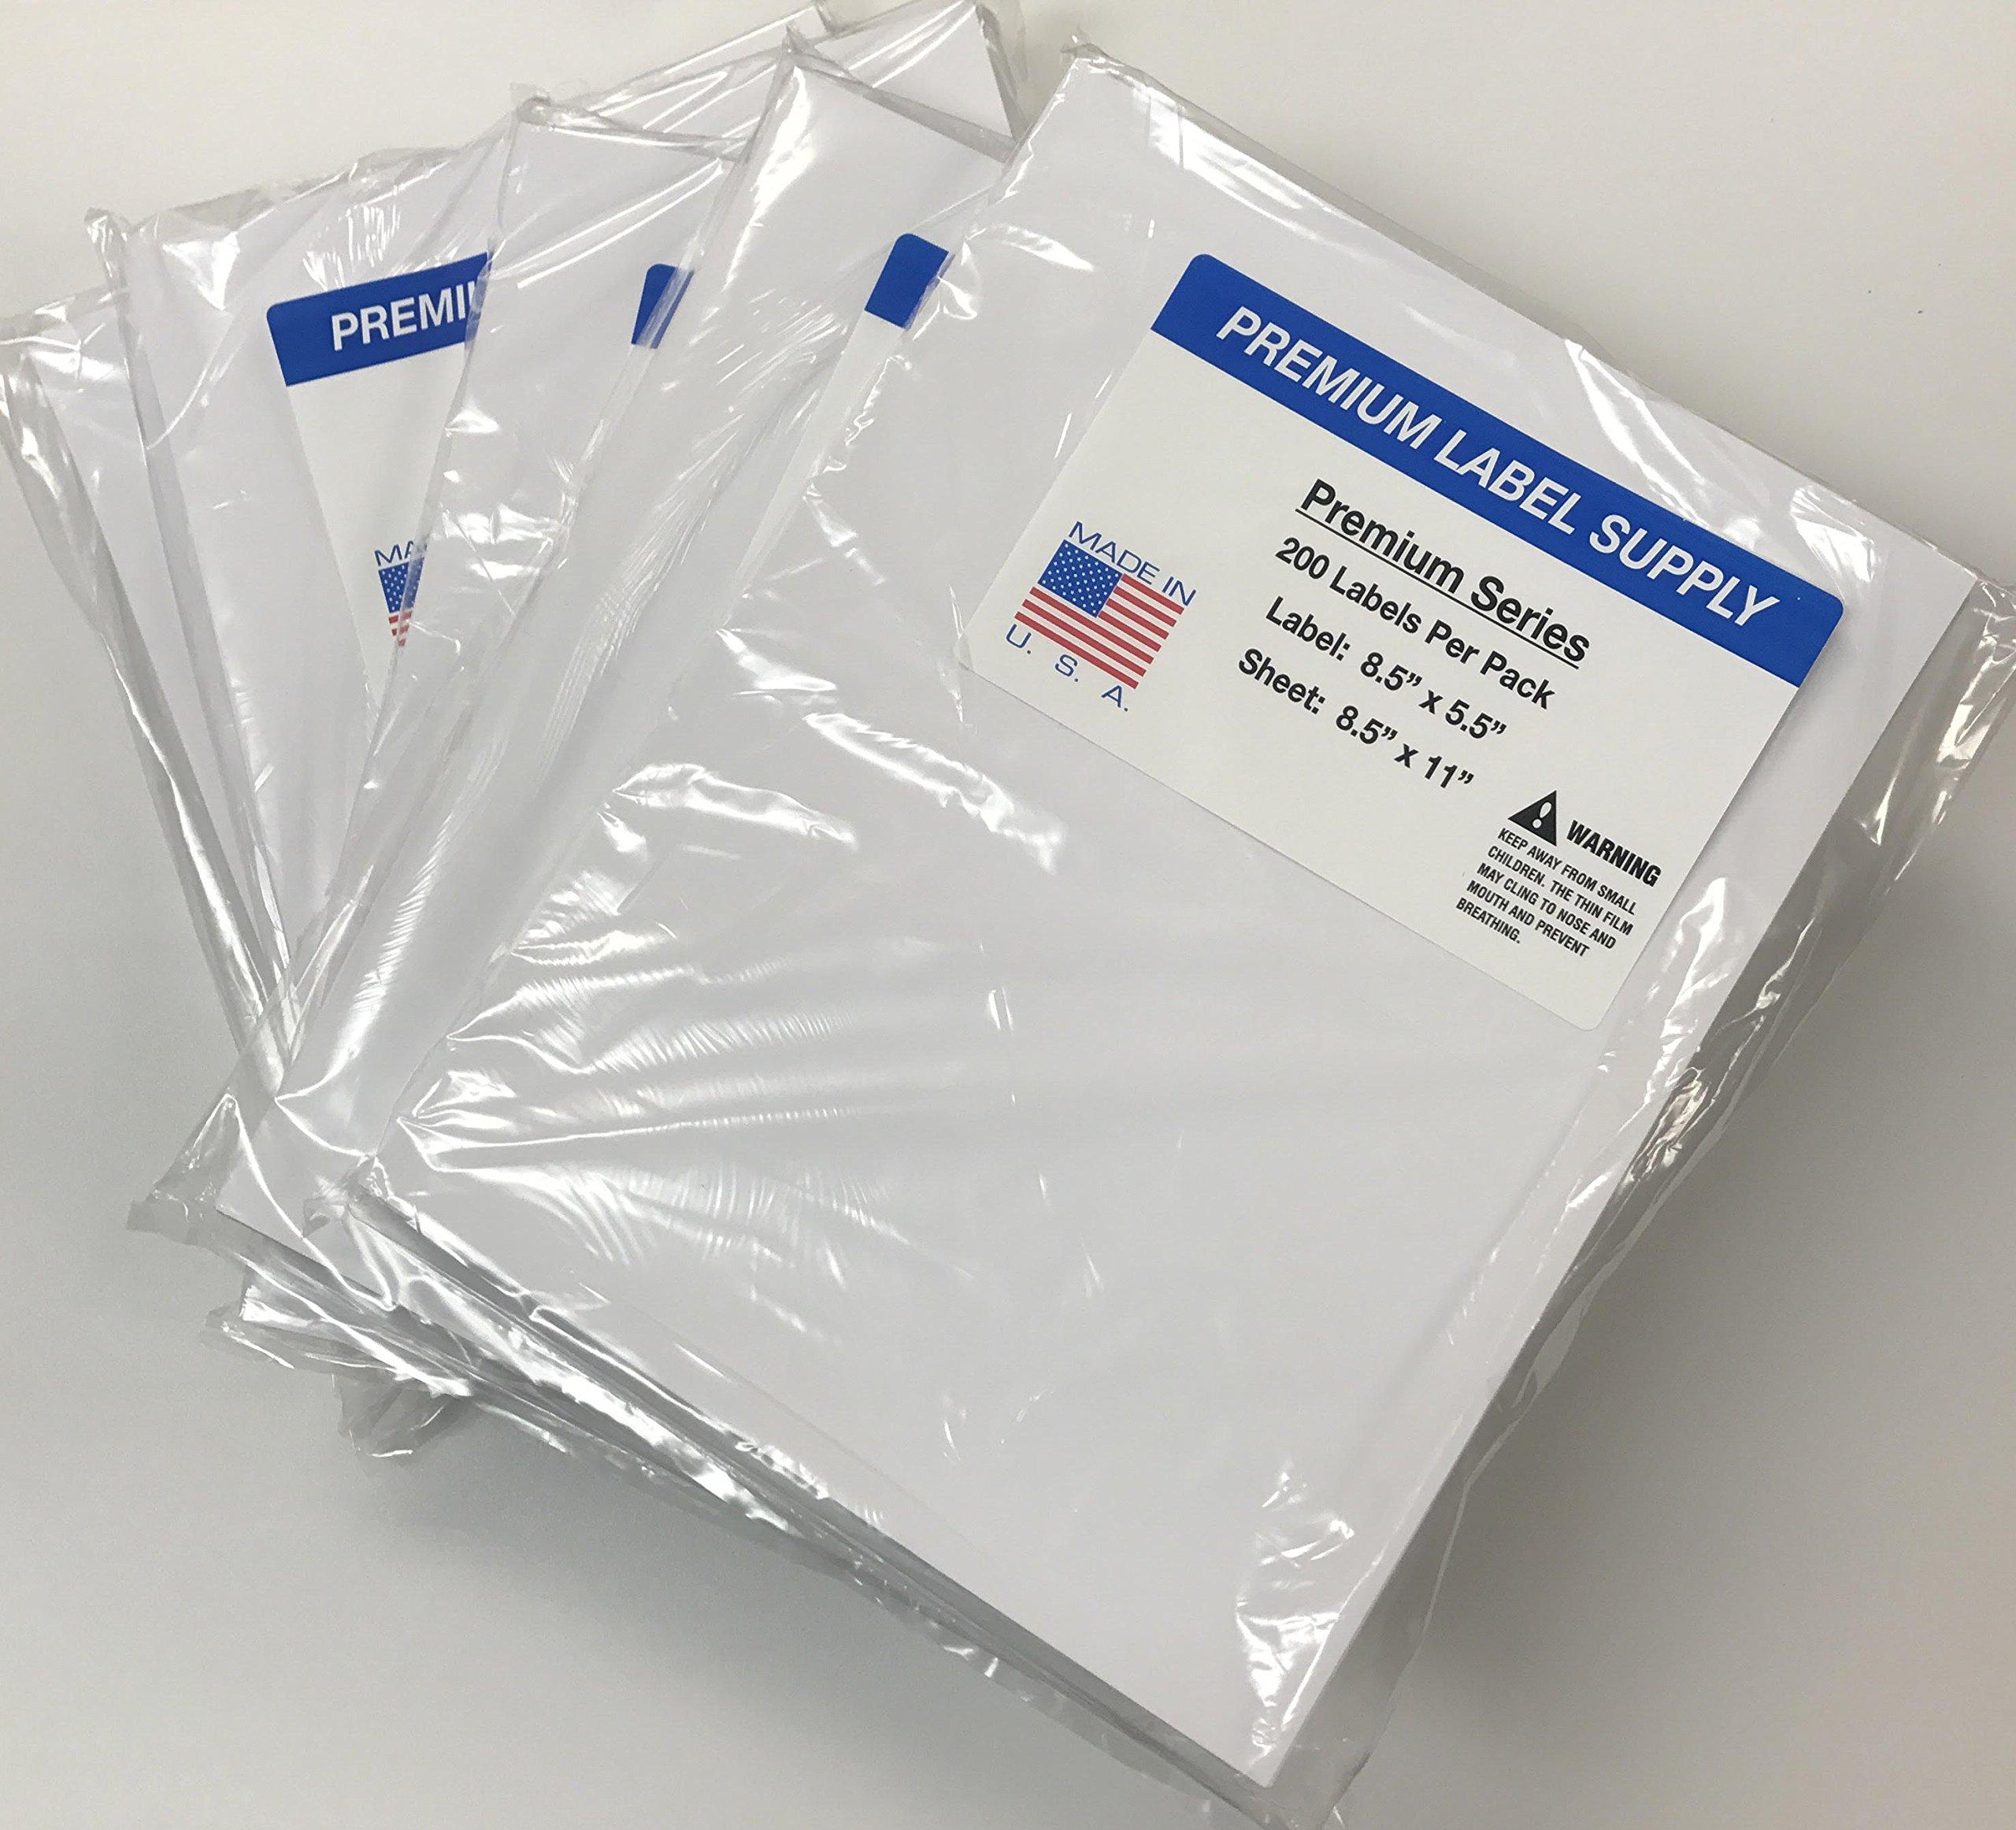 Premium Label Supply 8.5 '' x 5.5'' Half Sheet Self Adhesive Shipping Labels for Laser or Inkjet Printer (1000 labels)